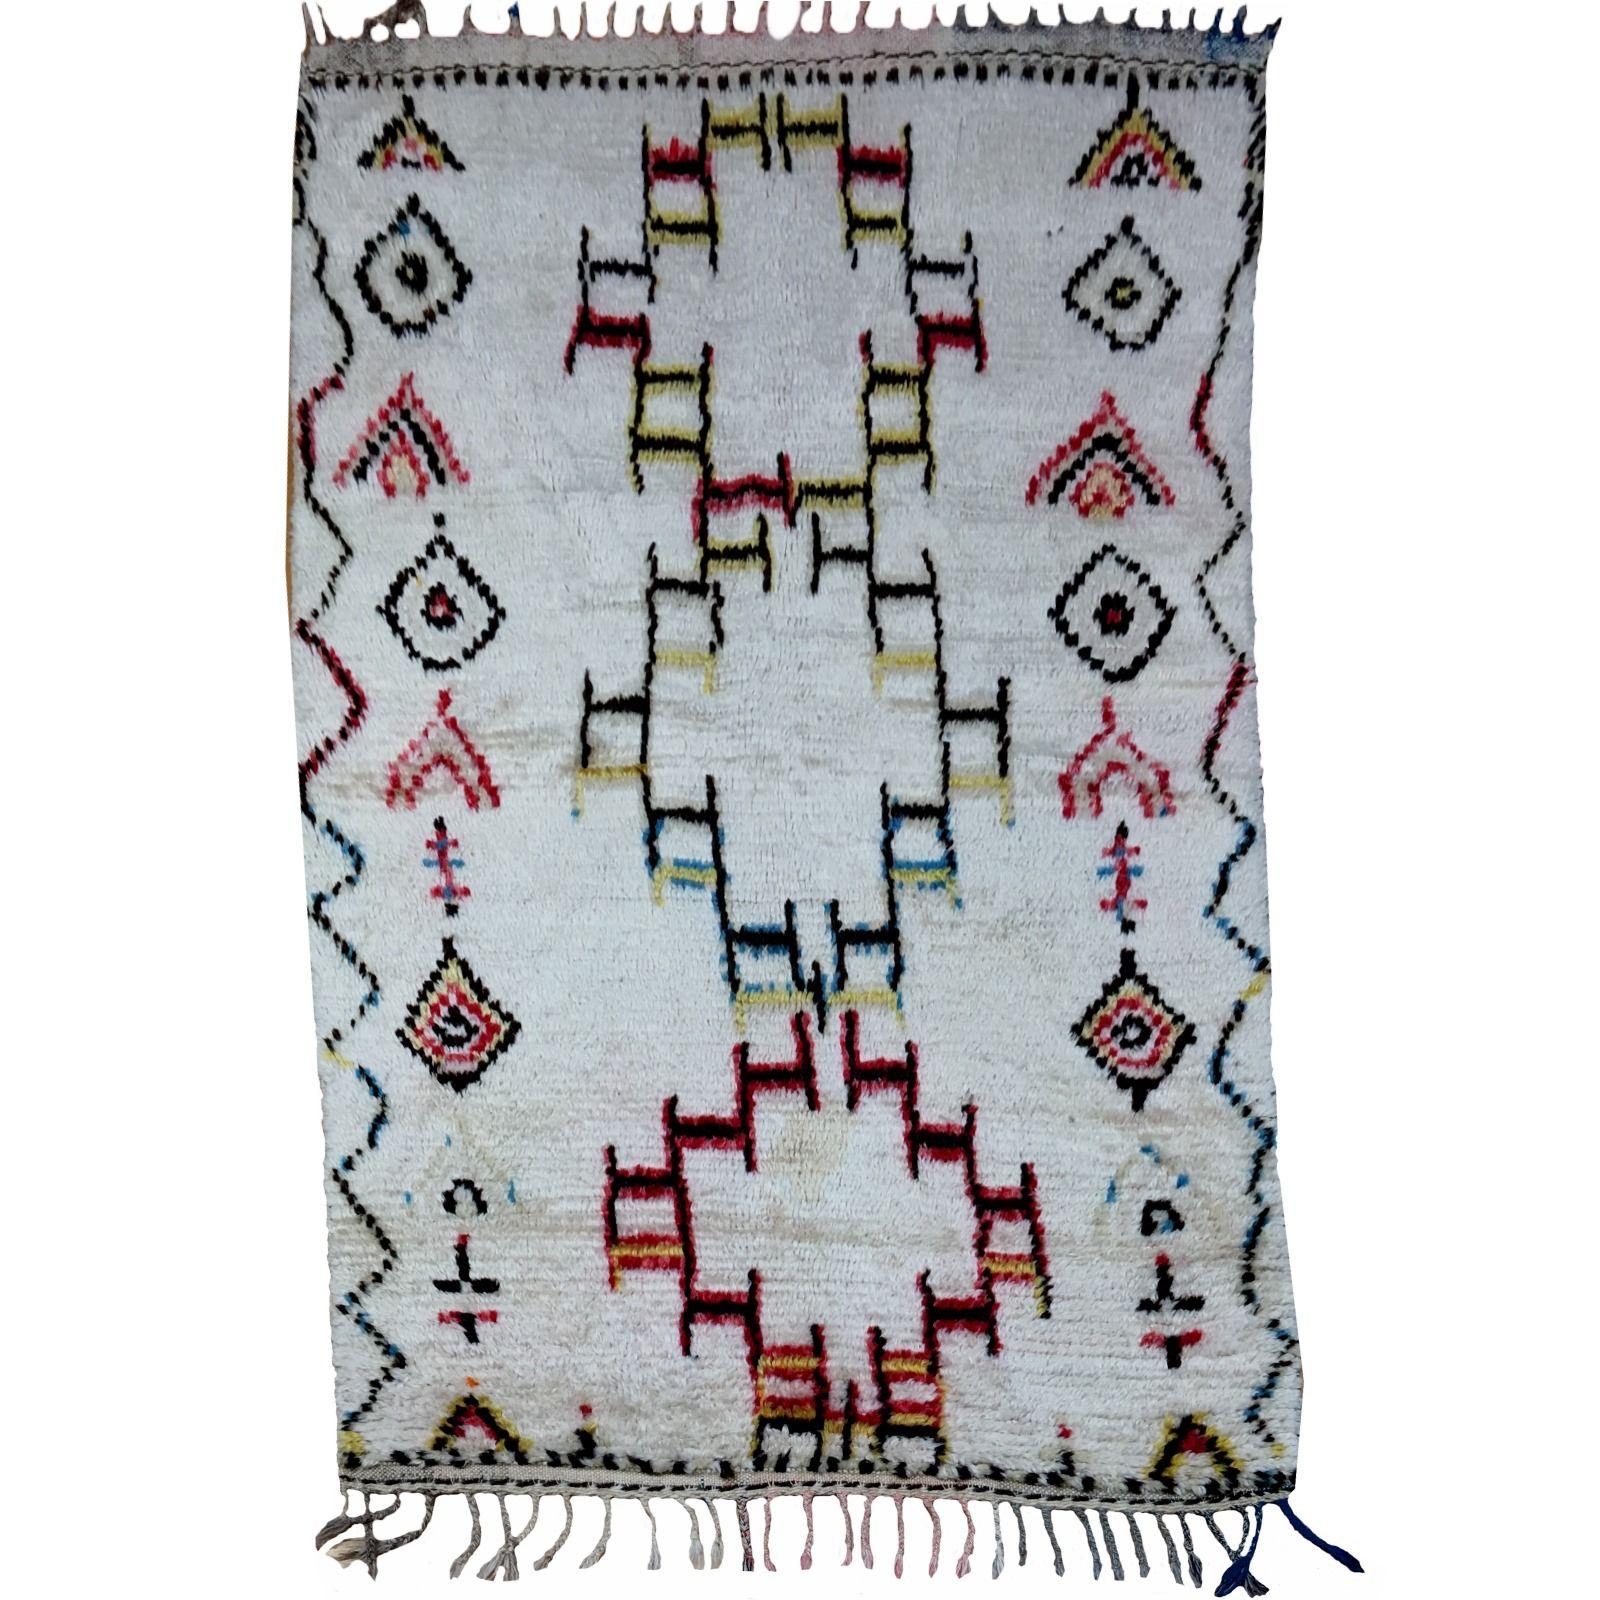 14972 Azilal Vintage 170 X 100 Cm Berber Teppich Marokko Sammlerteppich Berber Teppich Berber Teppich